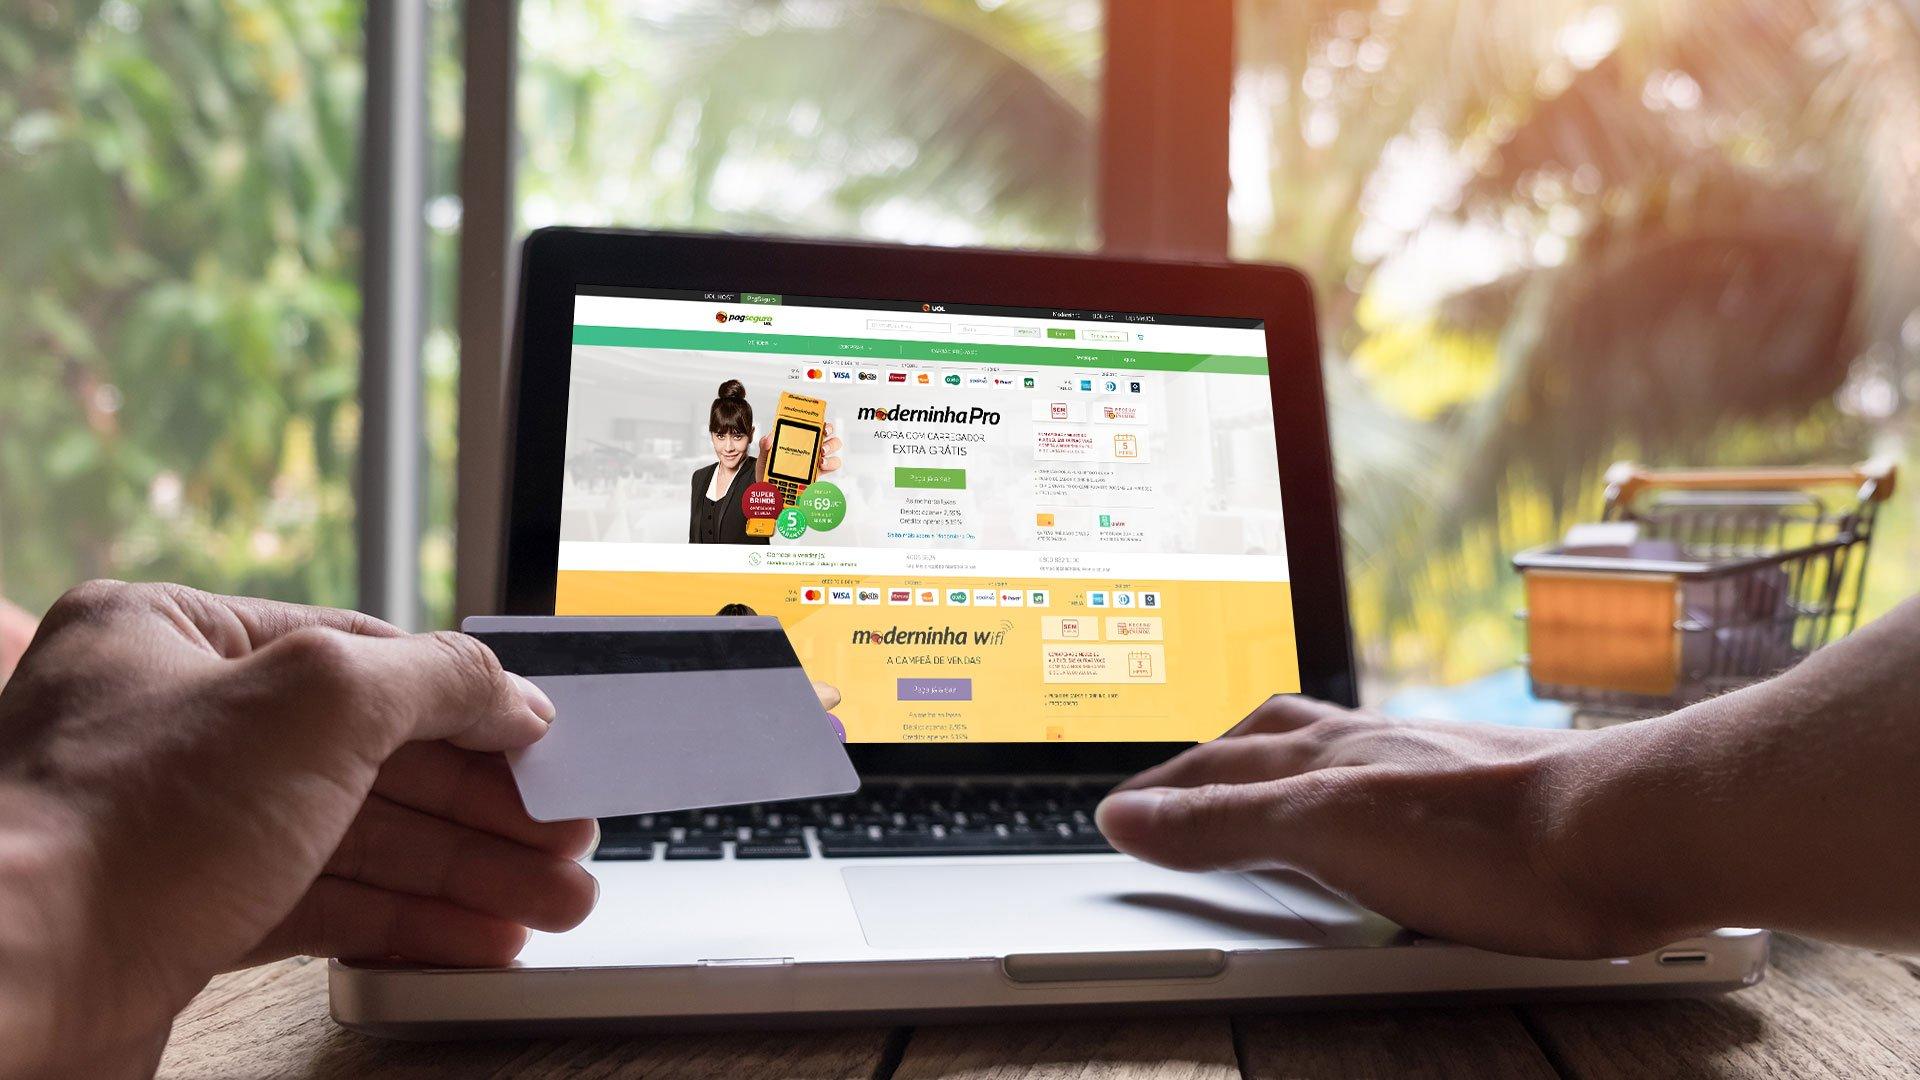 tabus do e-commerce segurança